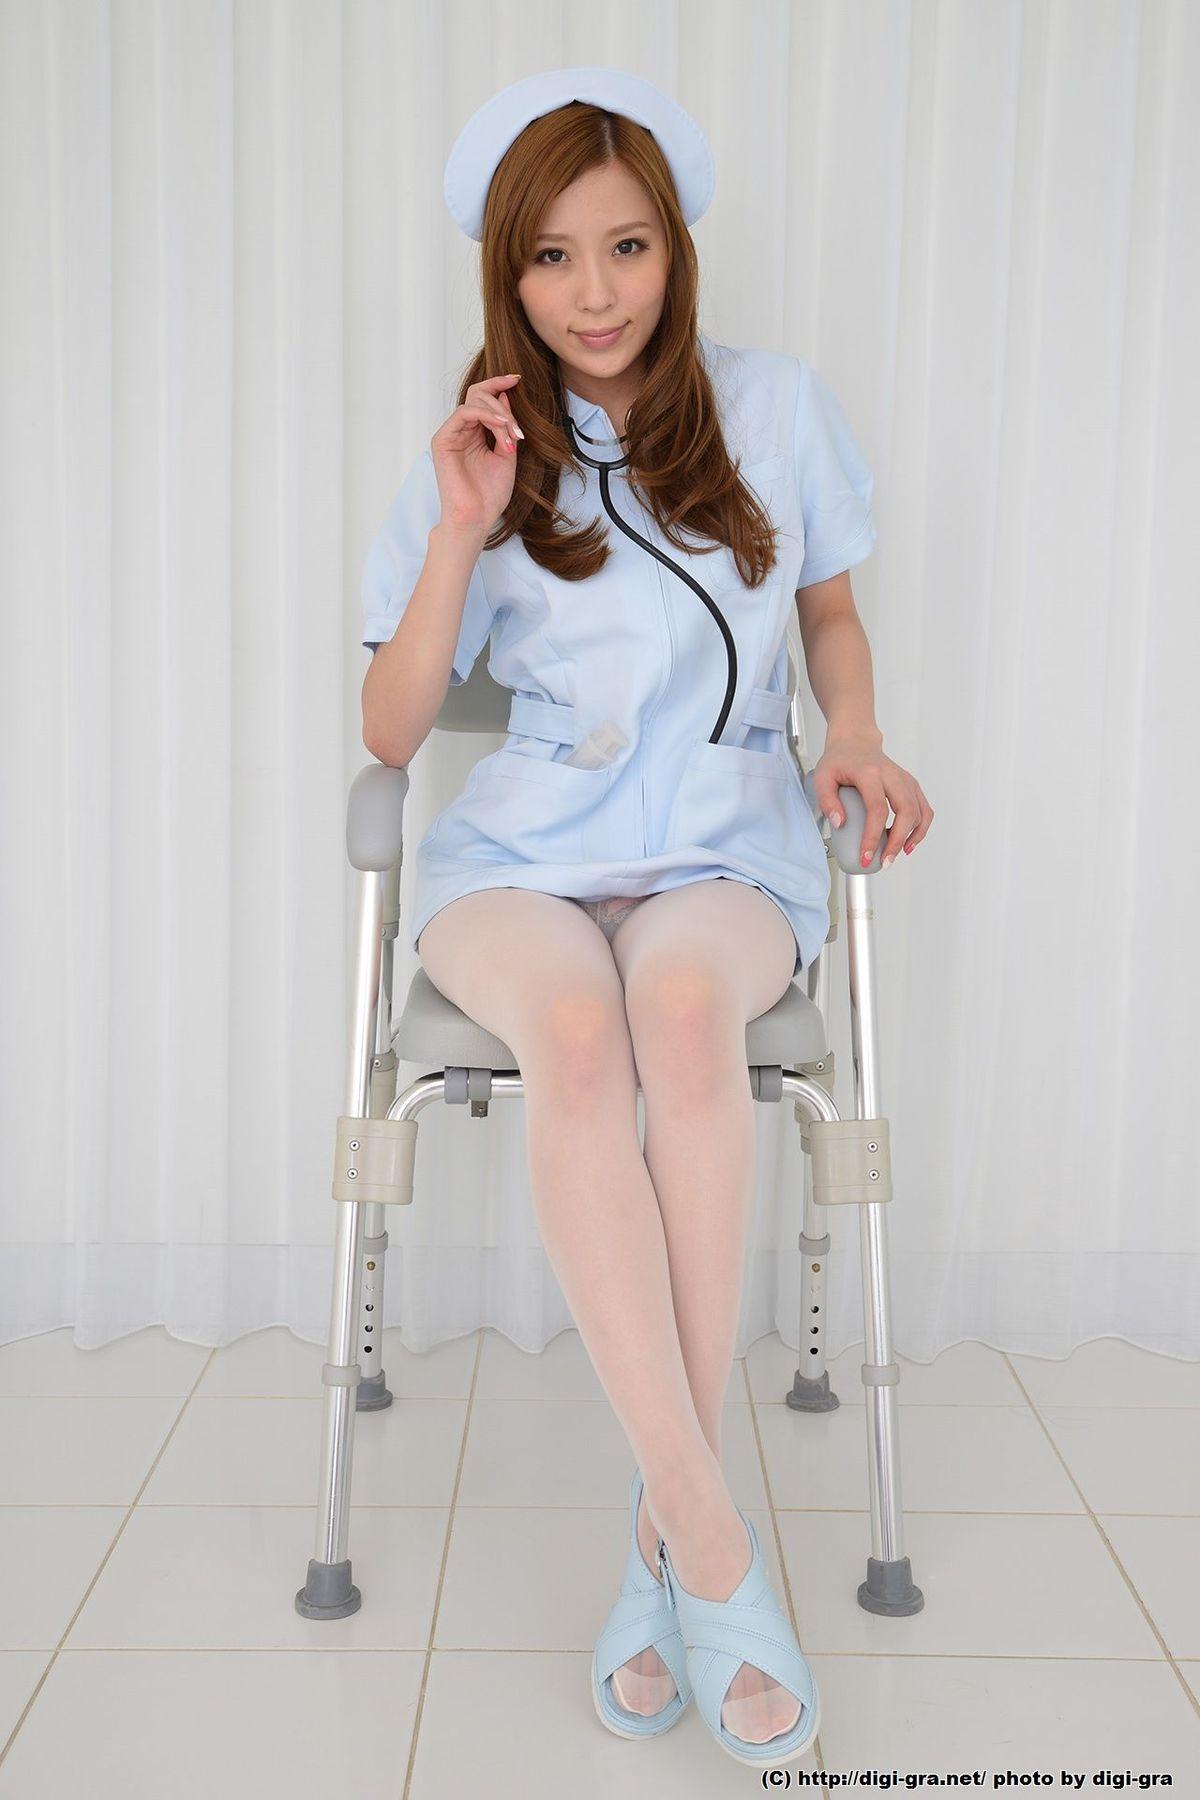 [Digi-Gra] Rin Sakuragi 桜木凛(凛太郎) Photoset 04 写真集1